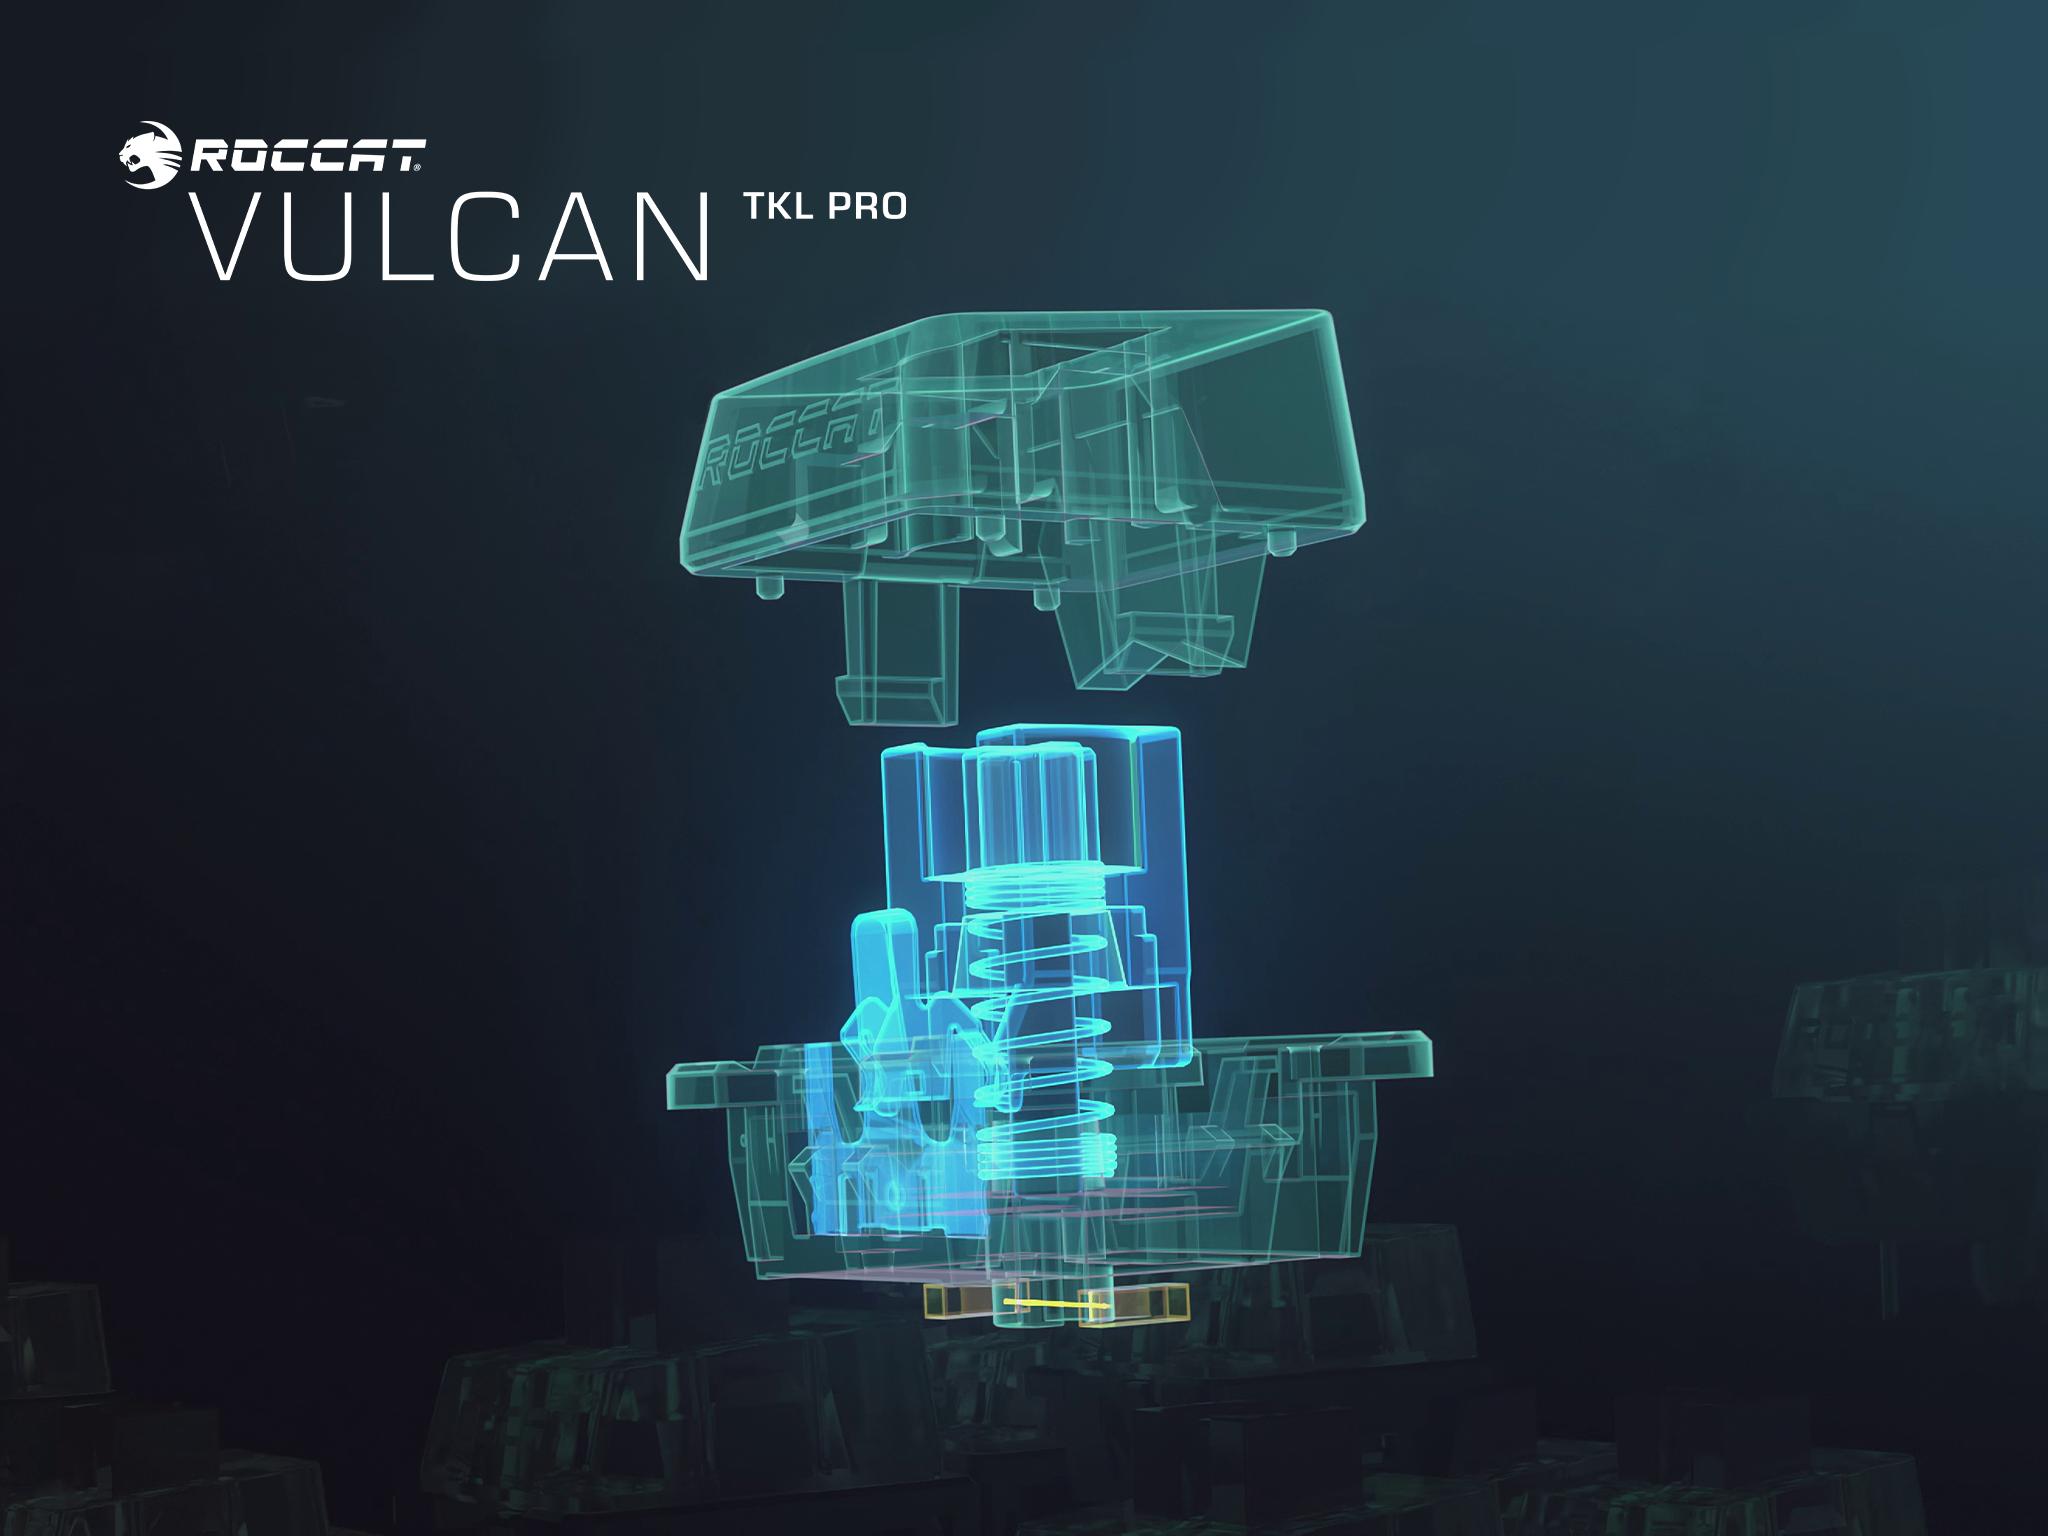 Vulcan TKL Pro